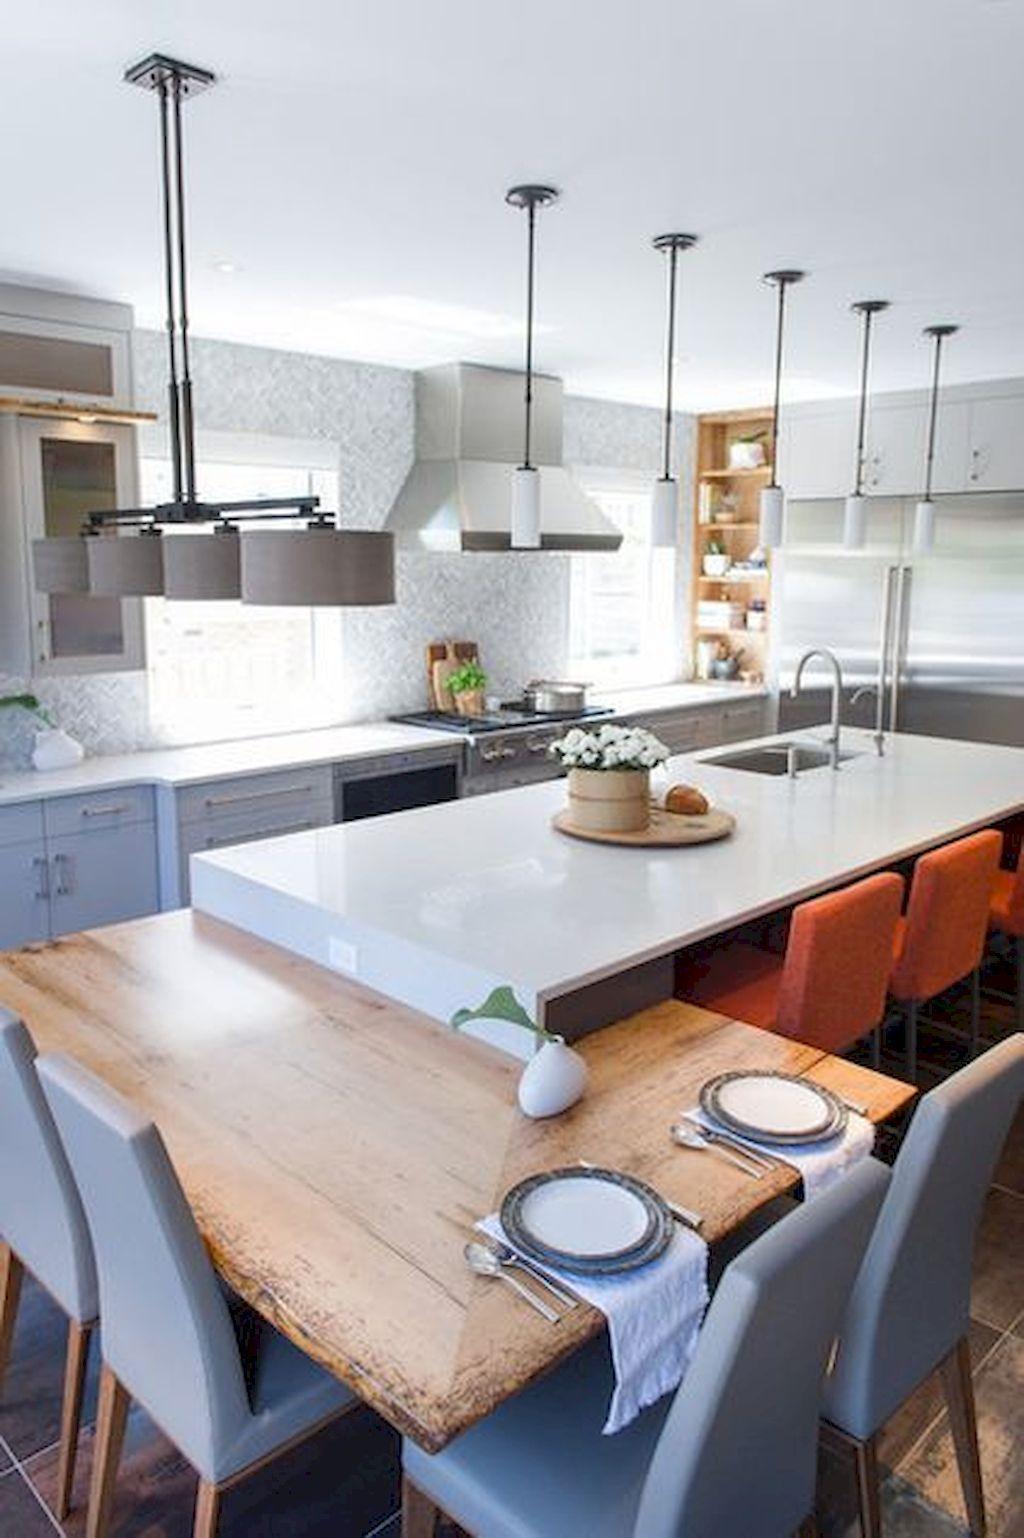 Stunning Small Island Kitchen Table Ideas Home To Z Kitchen Design Small Kitchen Island Table Interior Design Kitchen